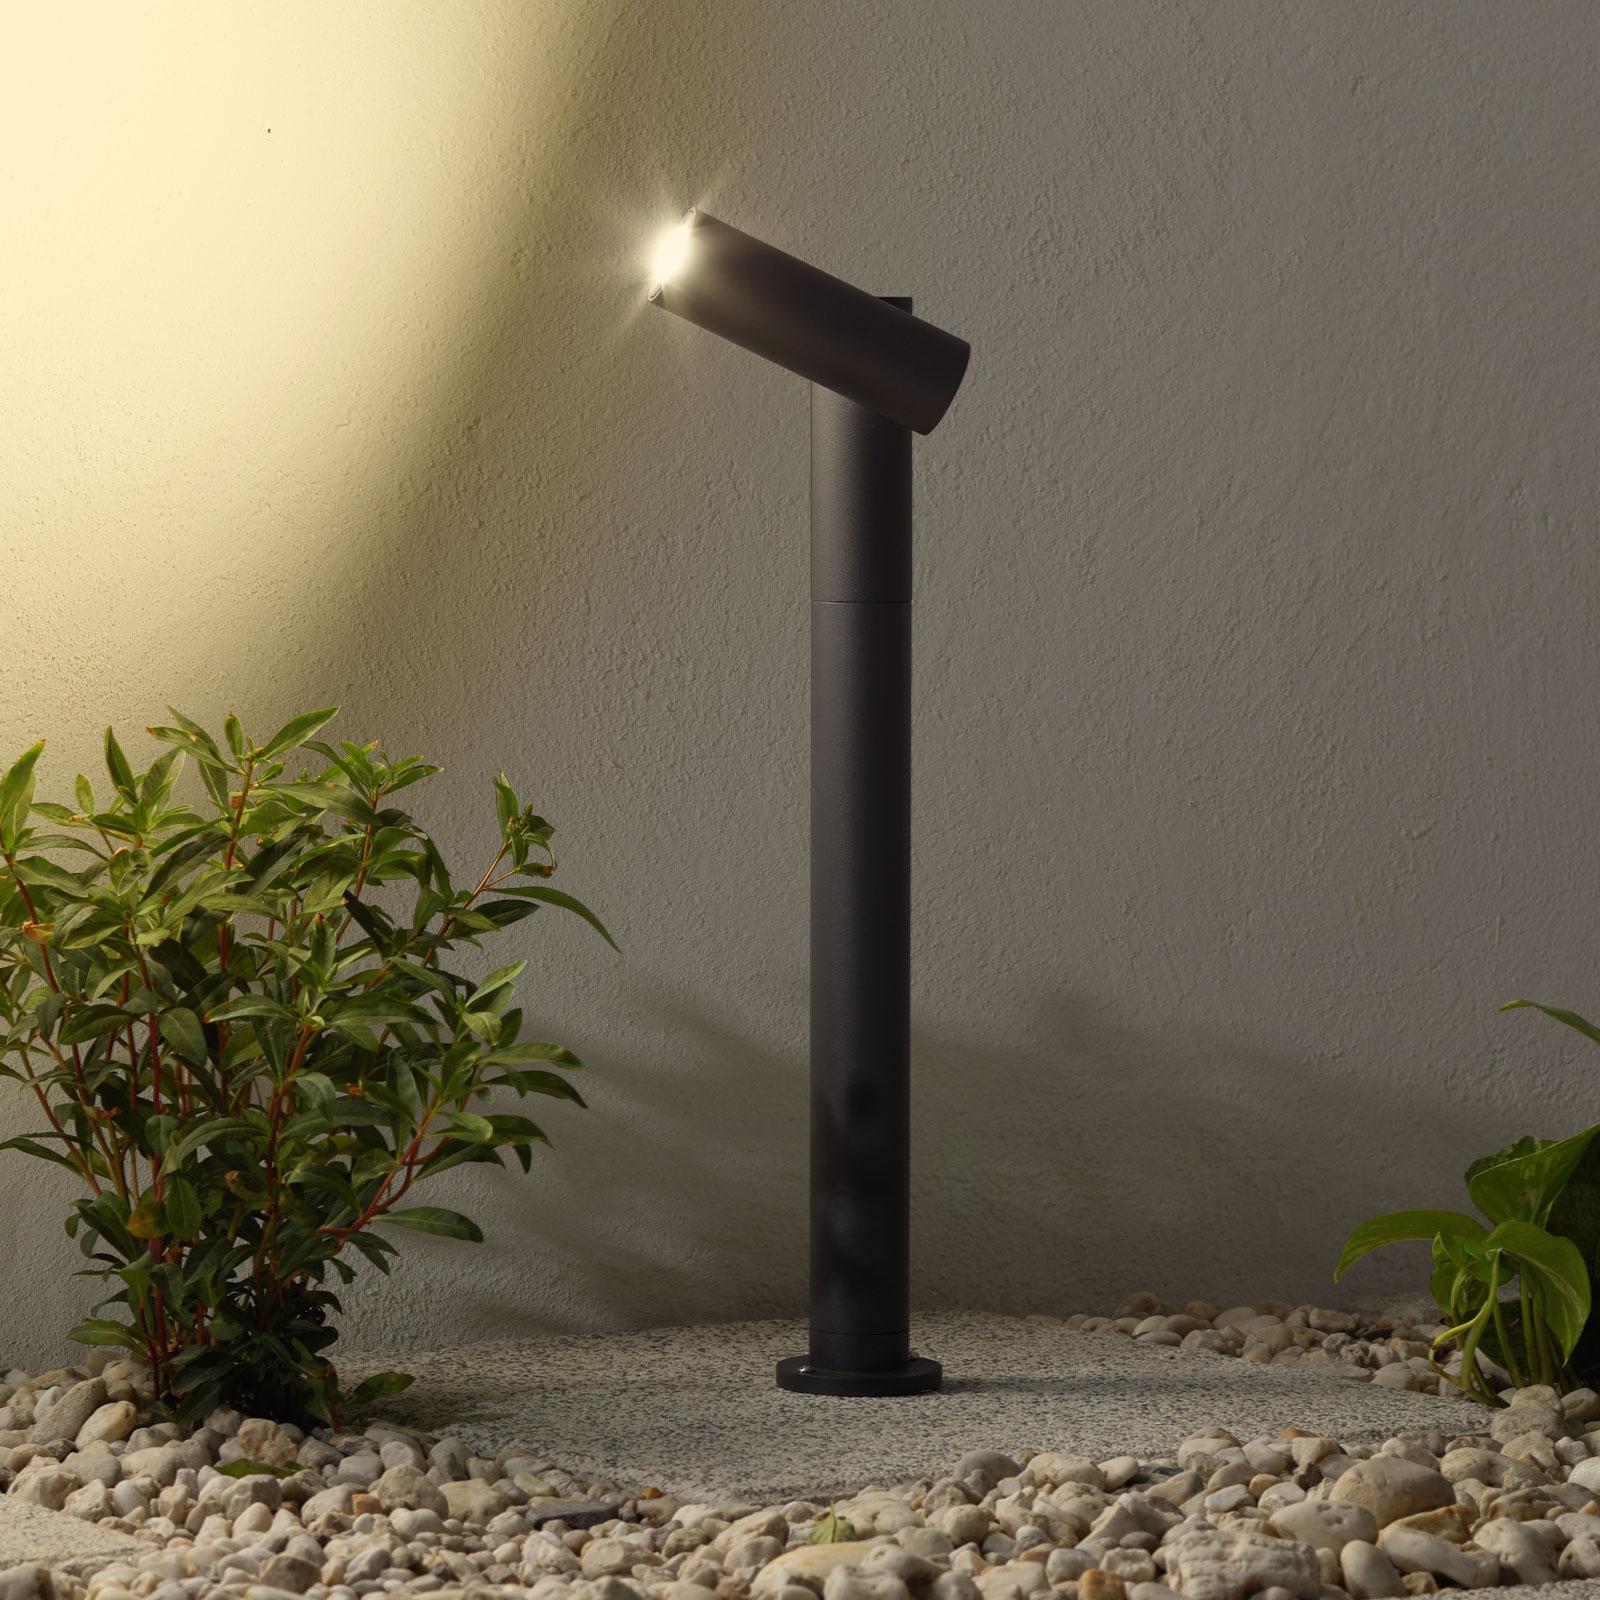 Lampione a LED Narea regolabile, 43 cm